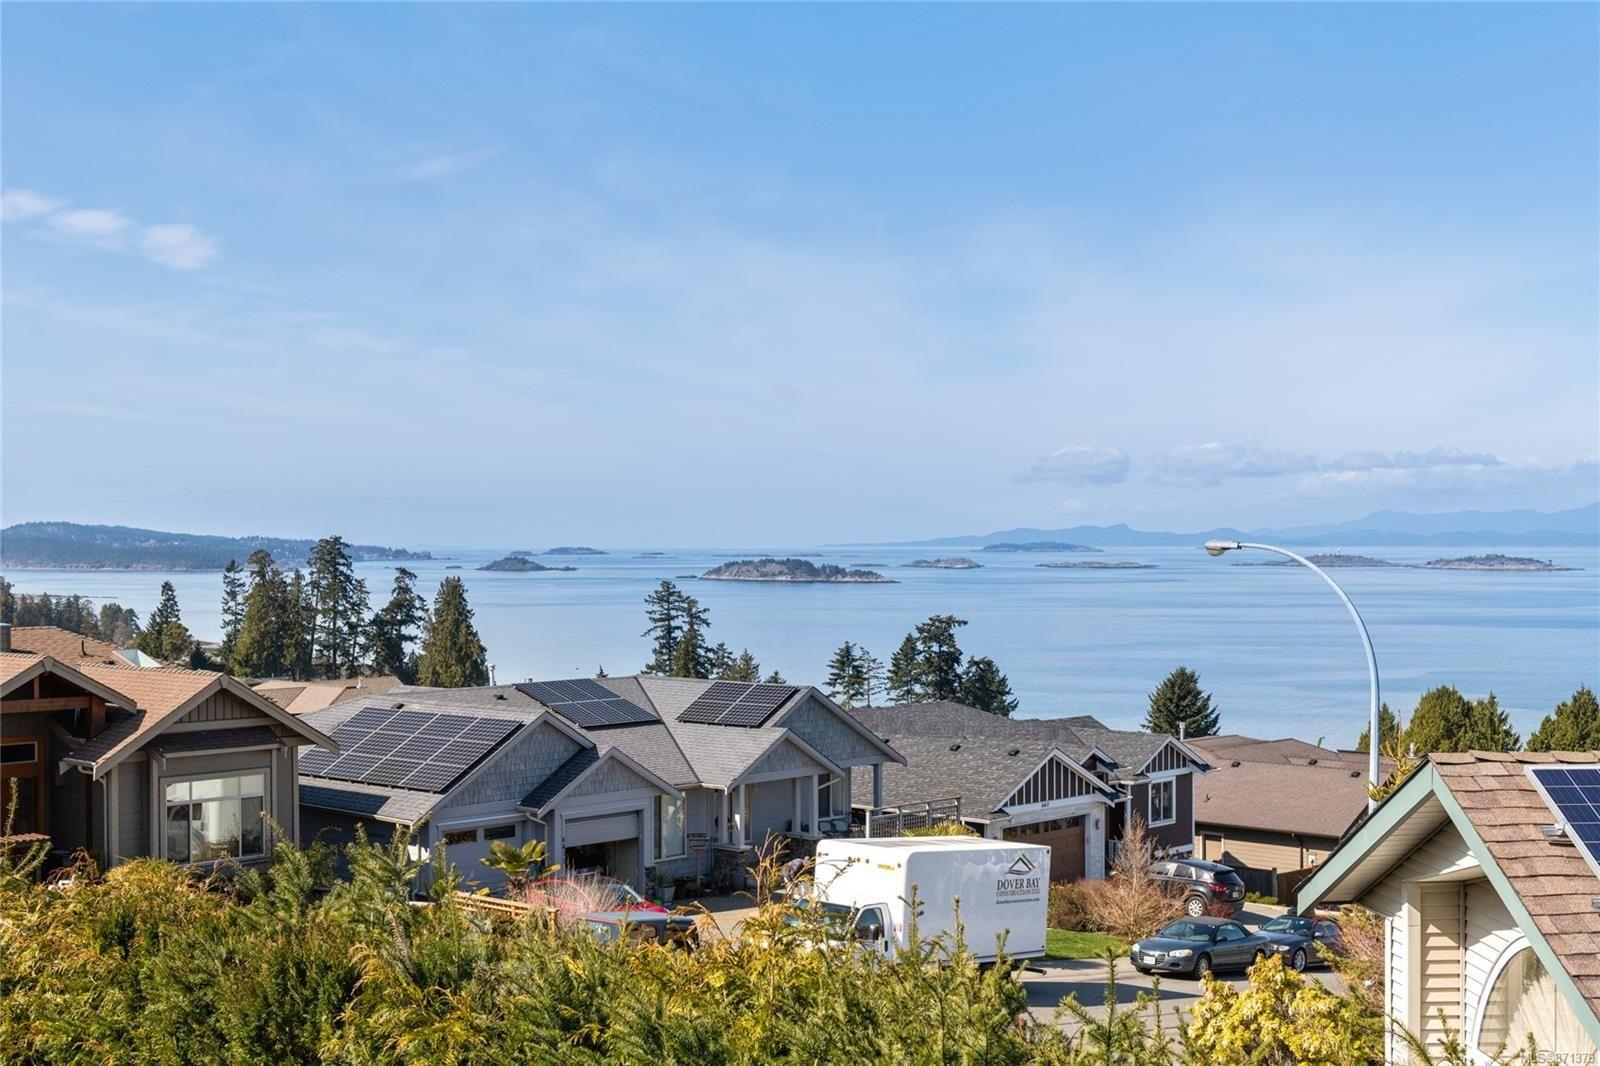 Main Photo: 6394 Groveland Dr in : Na North Nanaimo House for sale (Nanaimo)  : MLS®# 871379